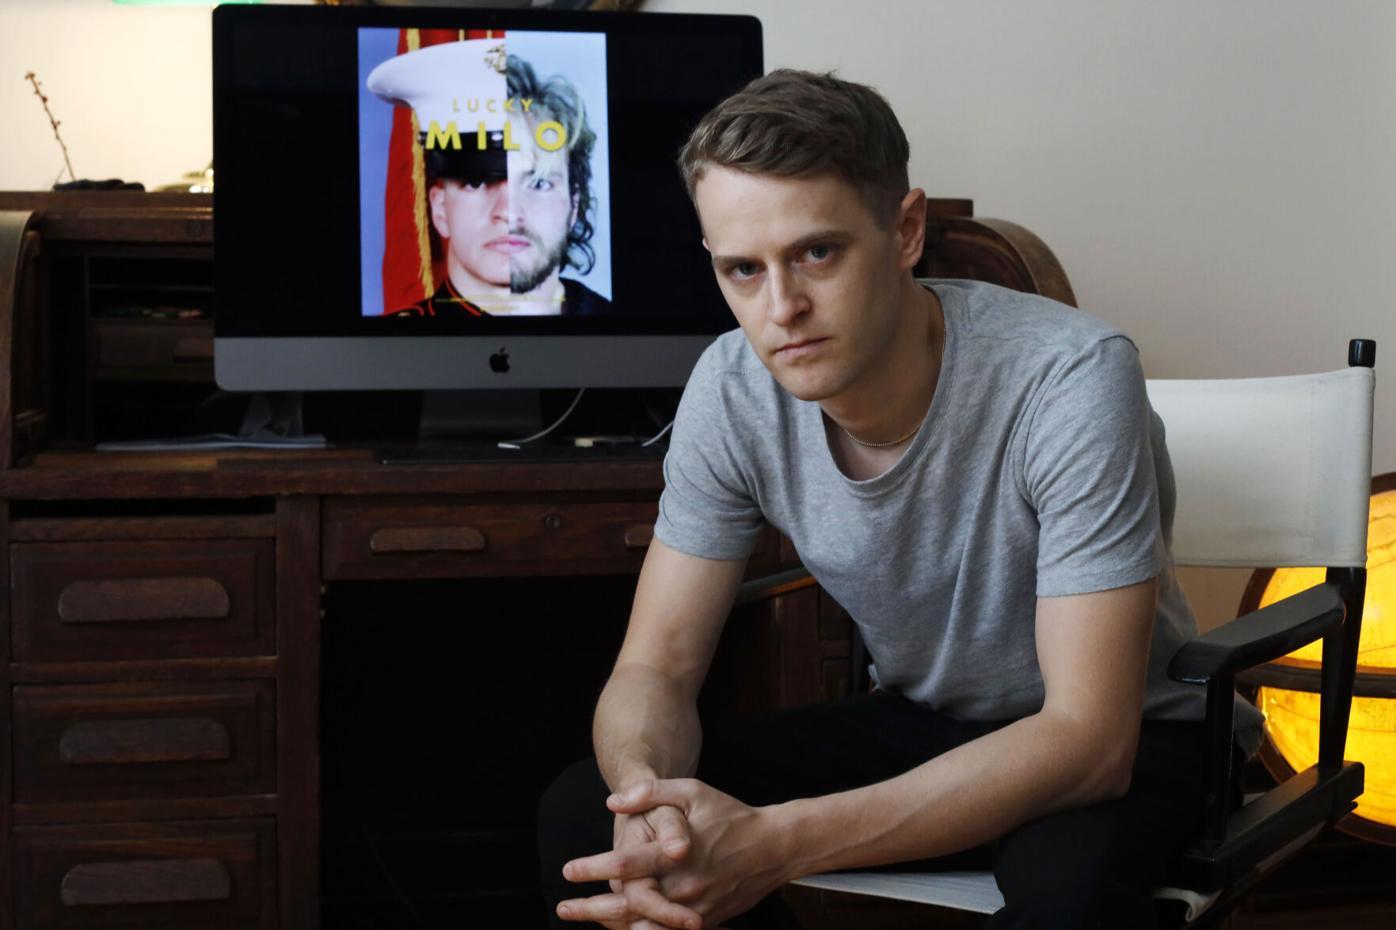 filmmaker Edmund Milligan Marcus in front of Lucky Milo film on computer